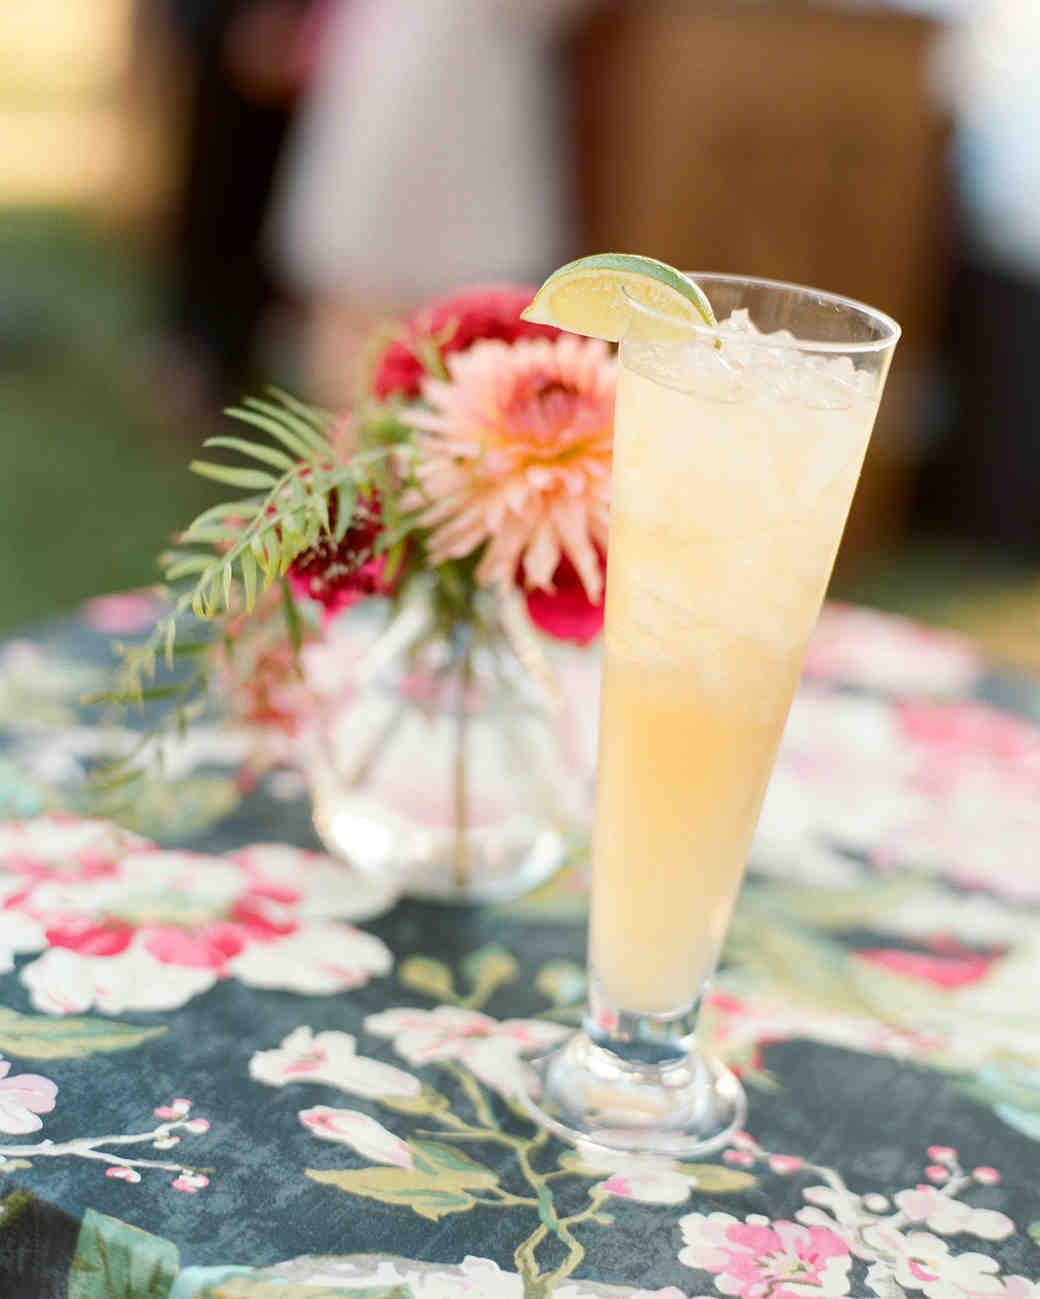 jen geoff wedding cocktail on table